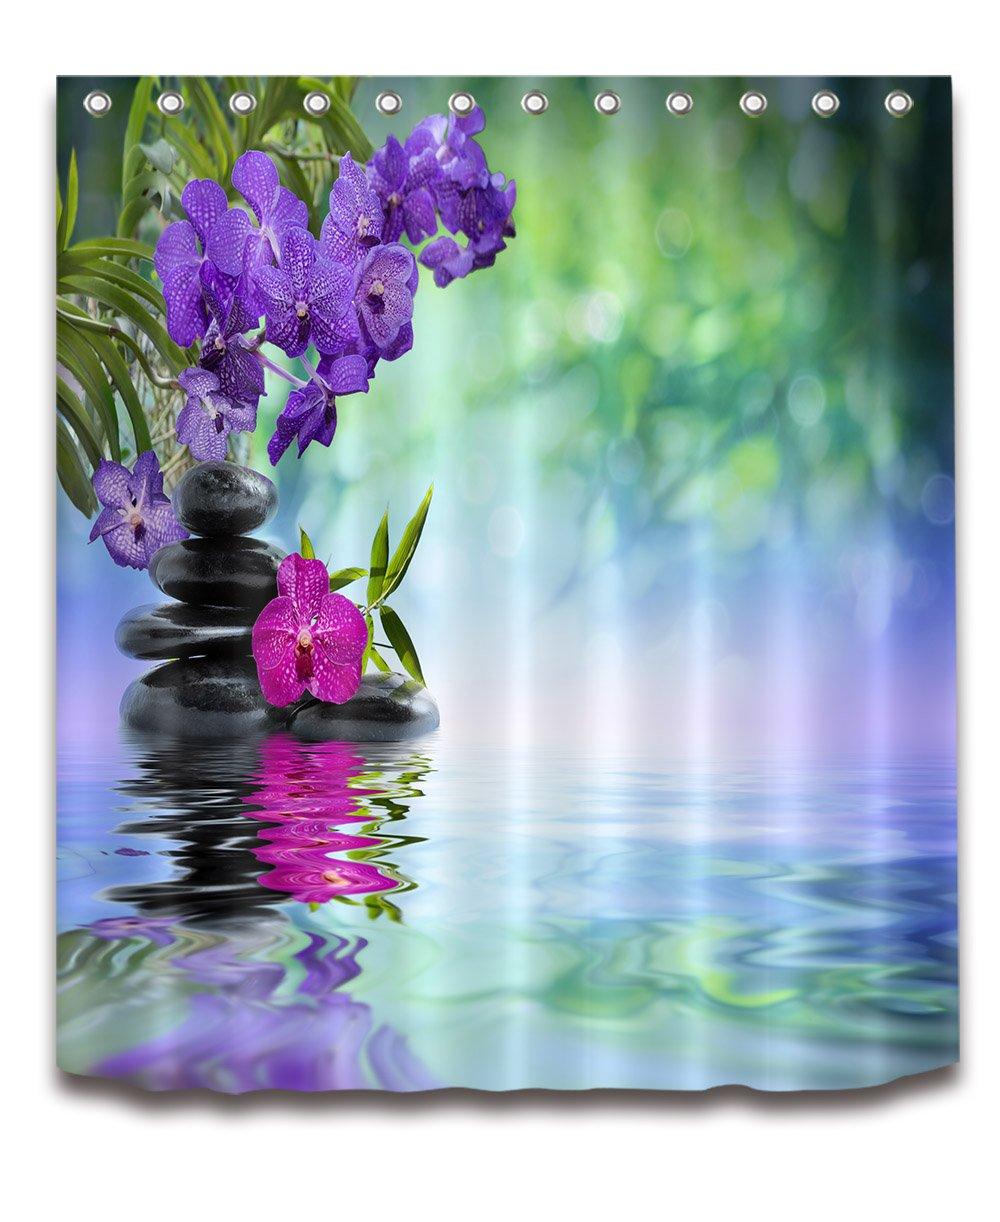 LB India Spa Zen Buddha Water Yoga Hot Spring Meditation Decoration Shower Curtain Polyester Fabric 3D 60x72 Waterproof Purple Orchid Flower Stone Bathroom Bath Curtains Liner Set Hooks